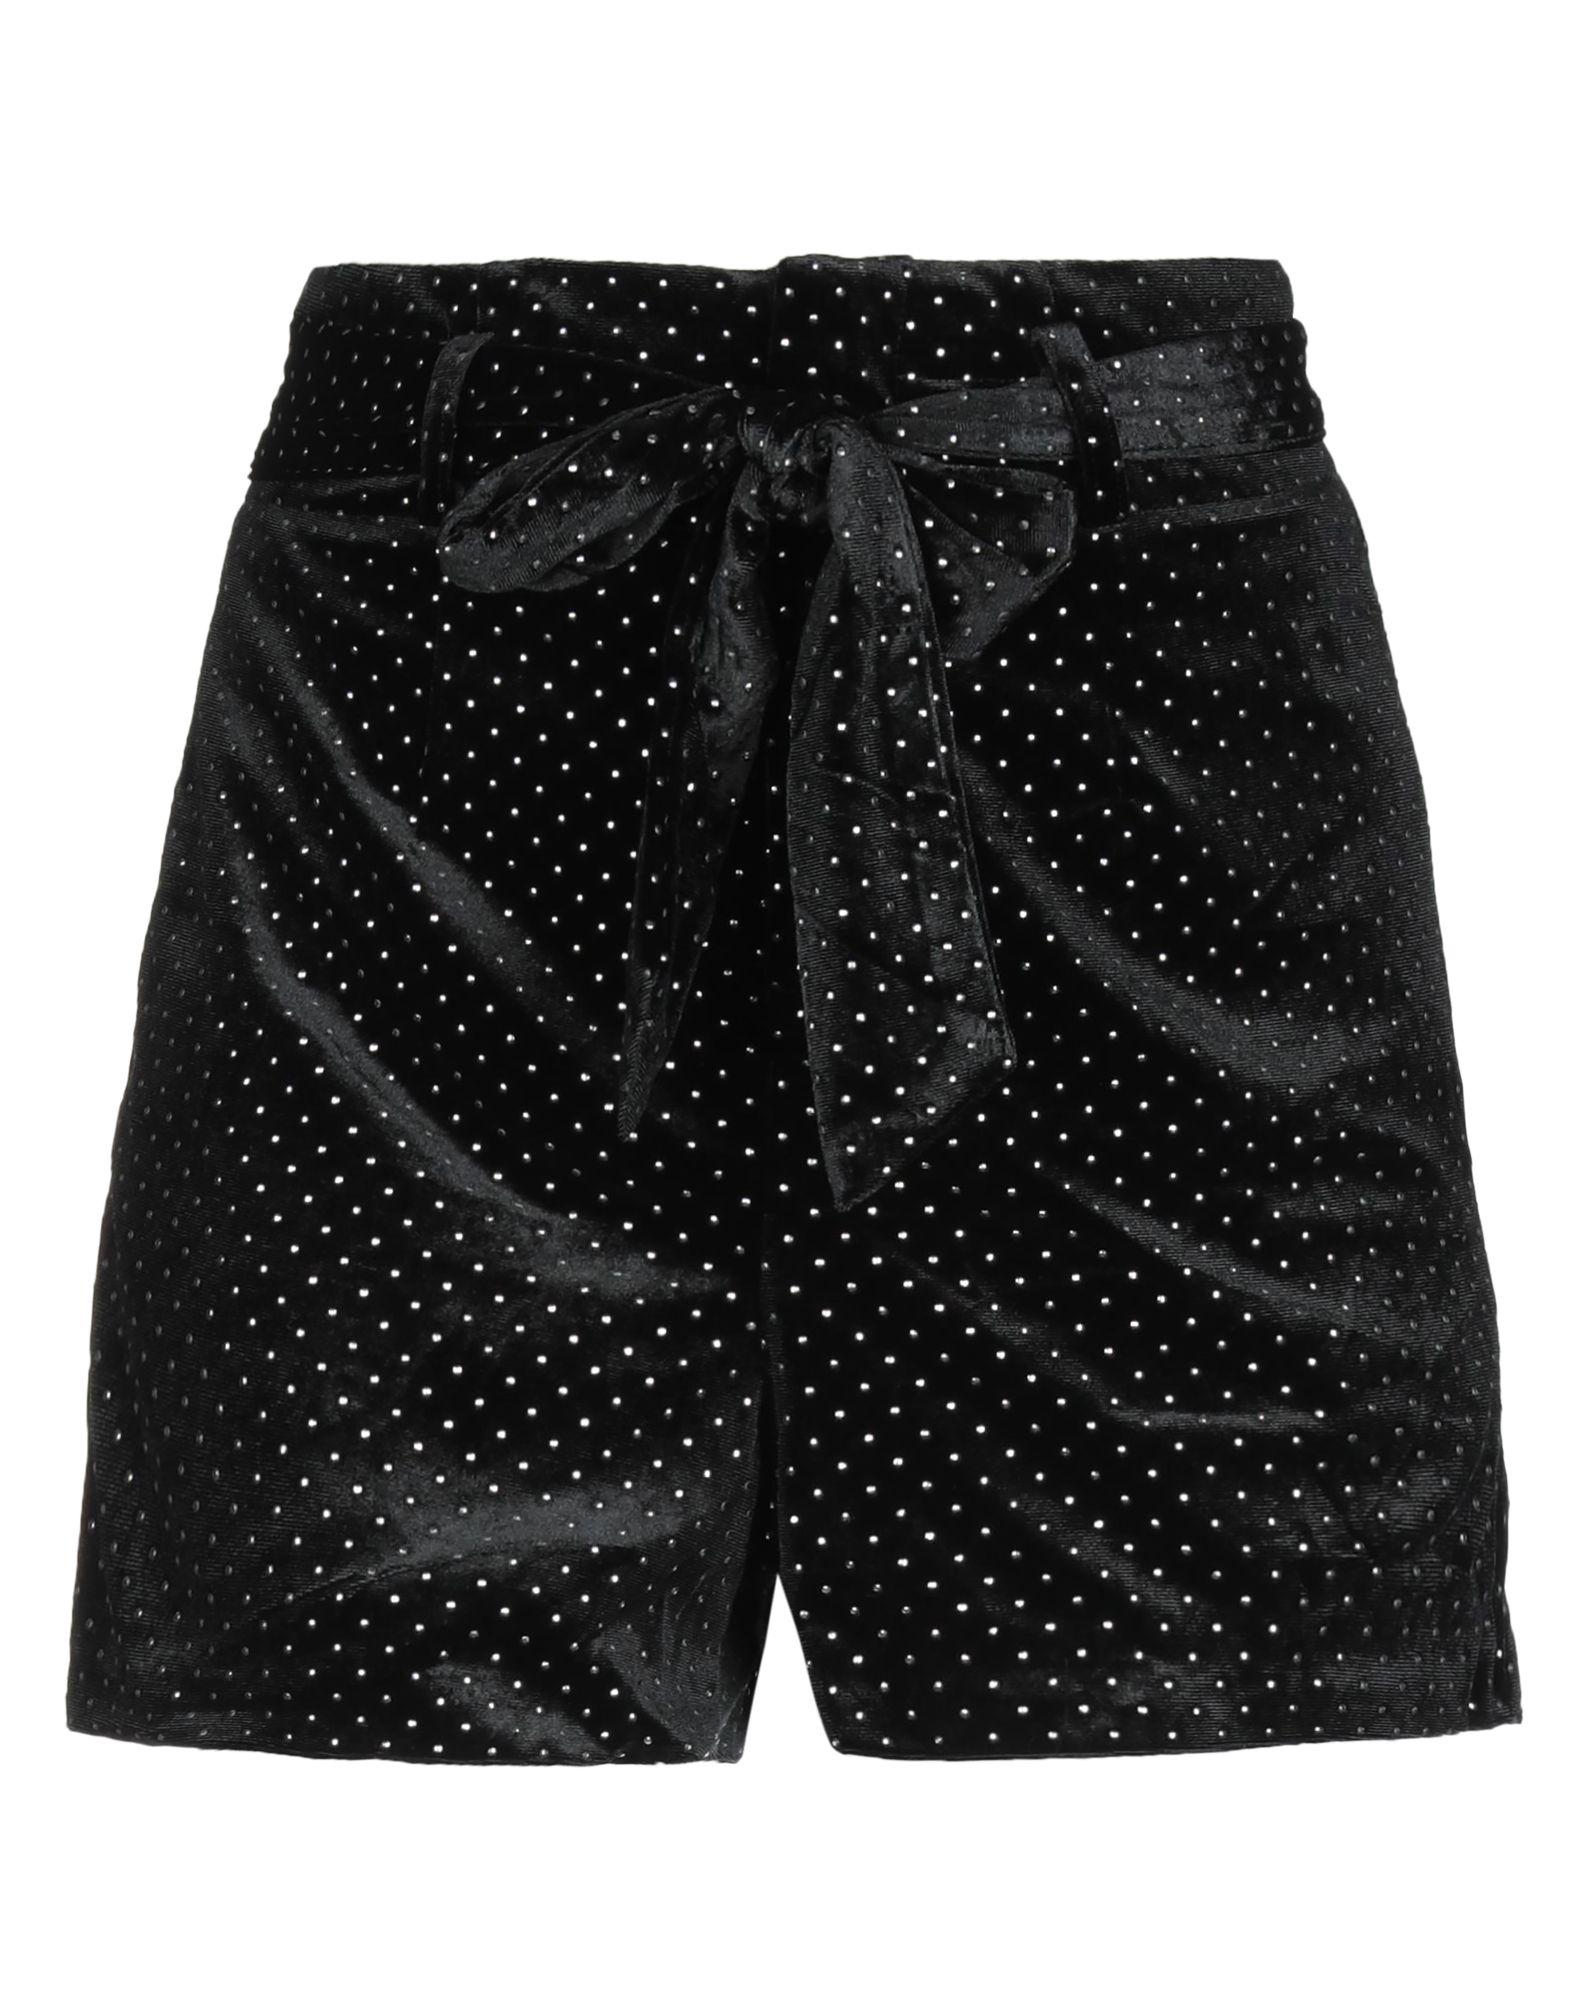 LILI SIDONIO by MOLLY BRACKEN Повседневные шорты